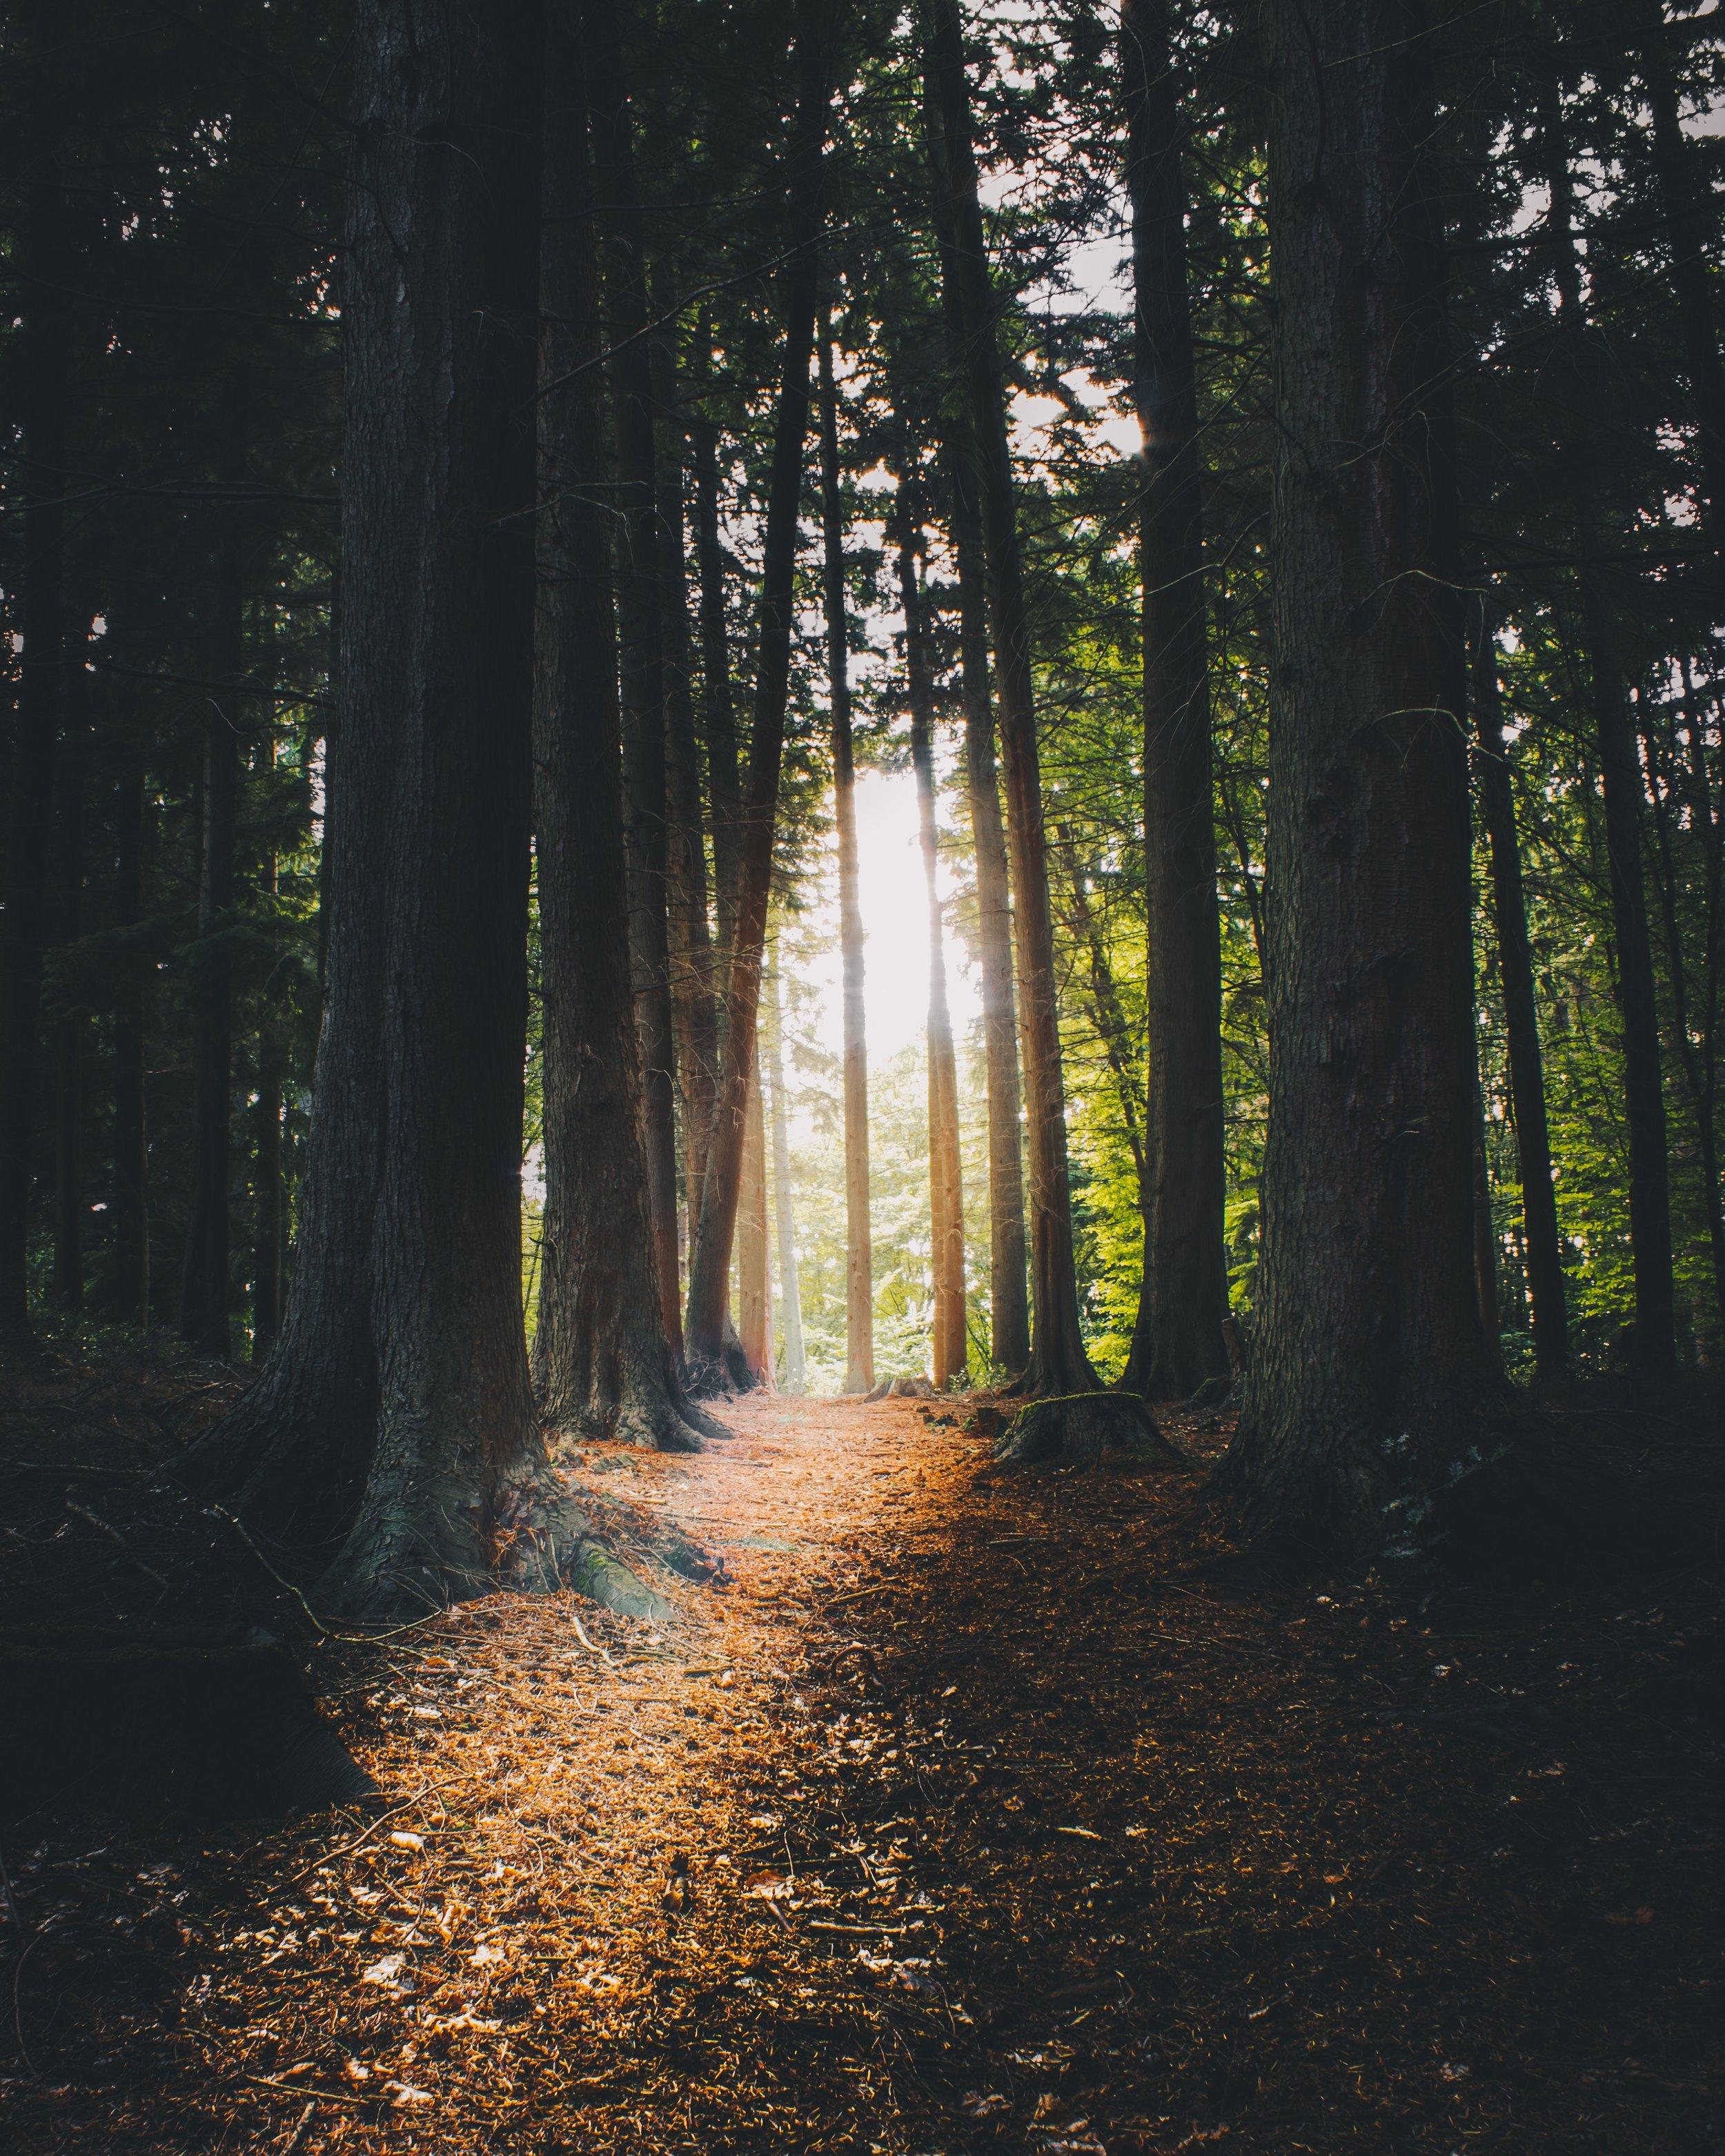 sunlit_forest_path.jpg